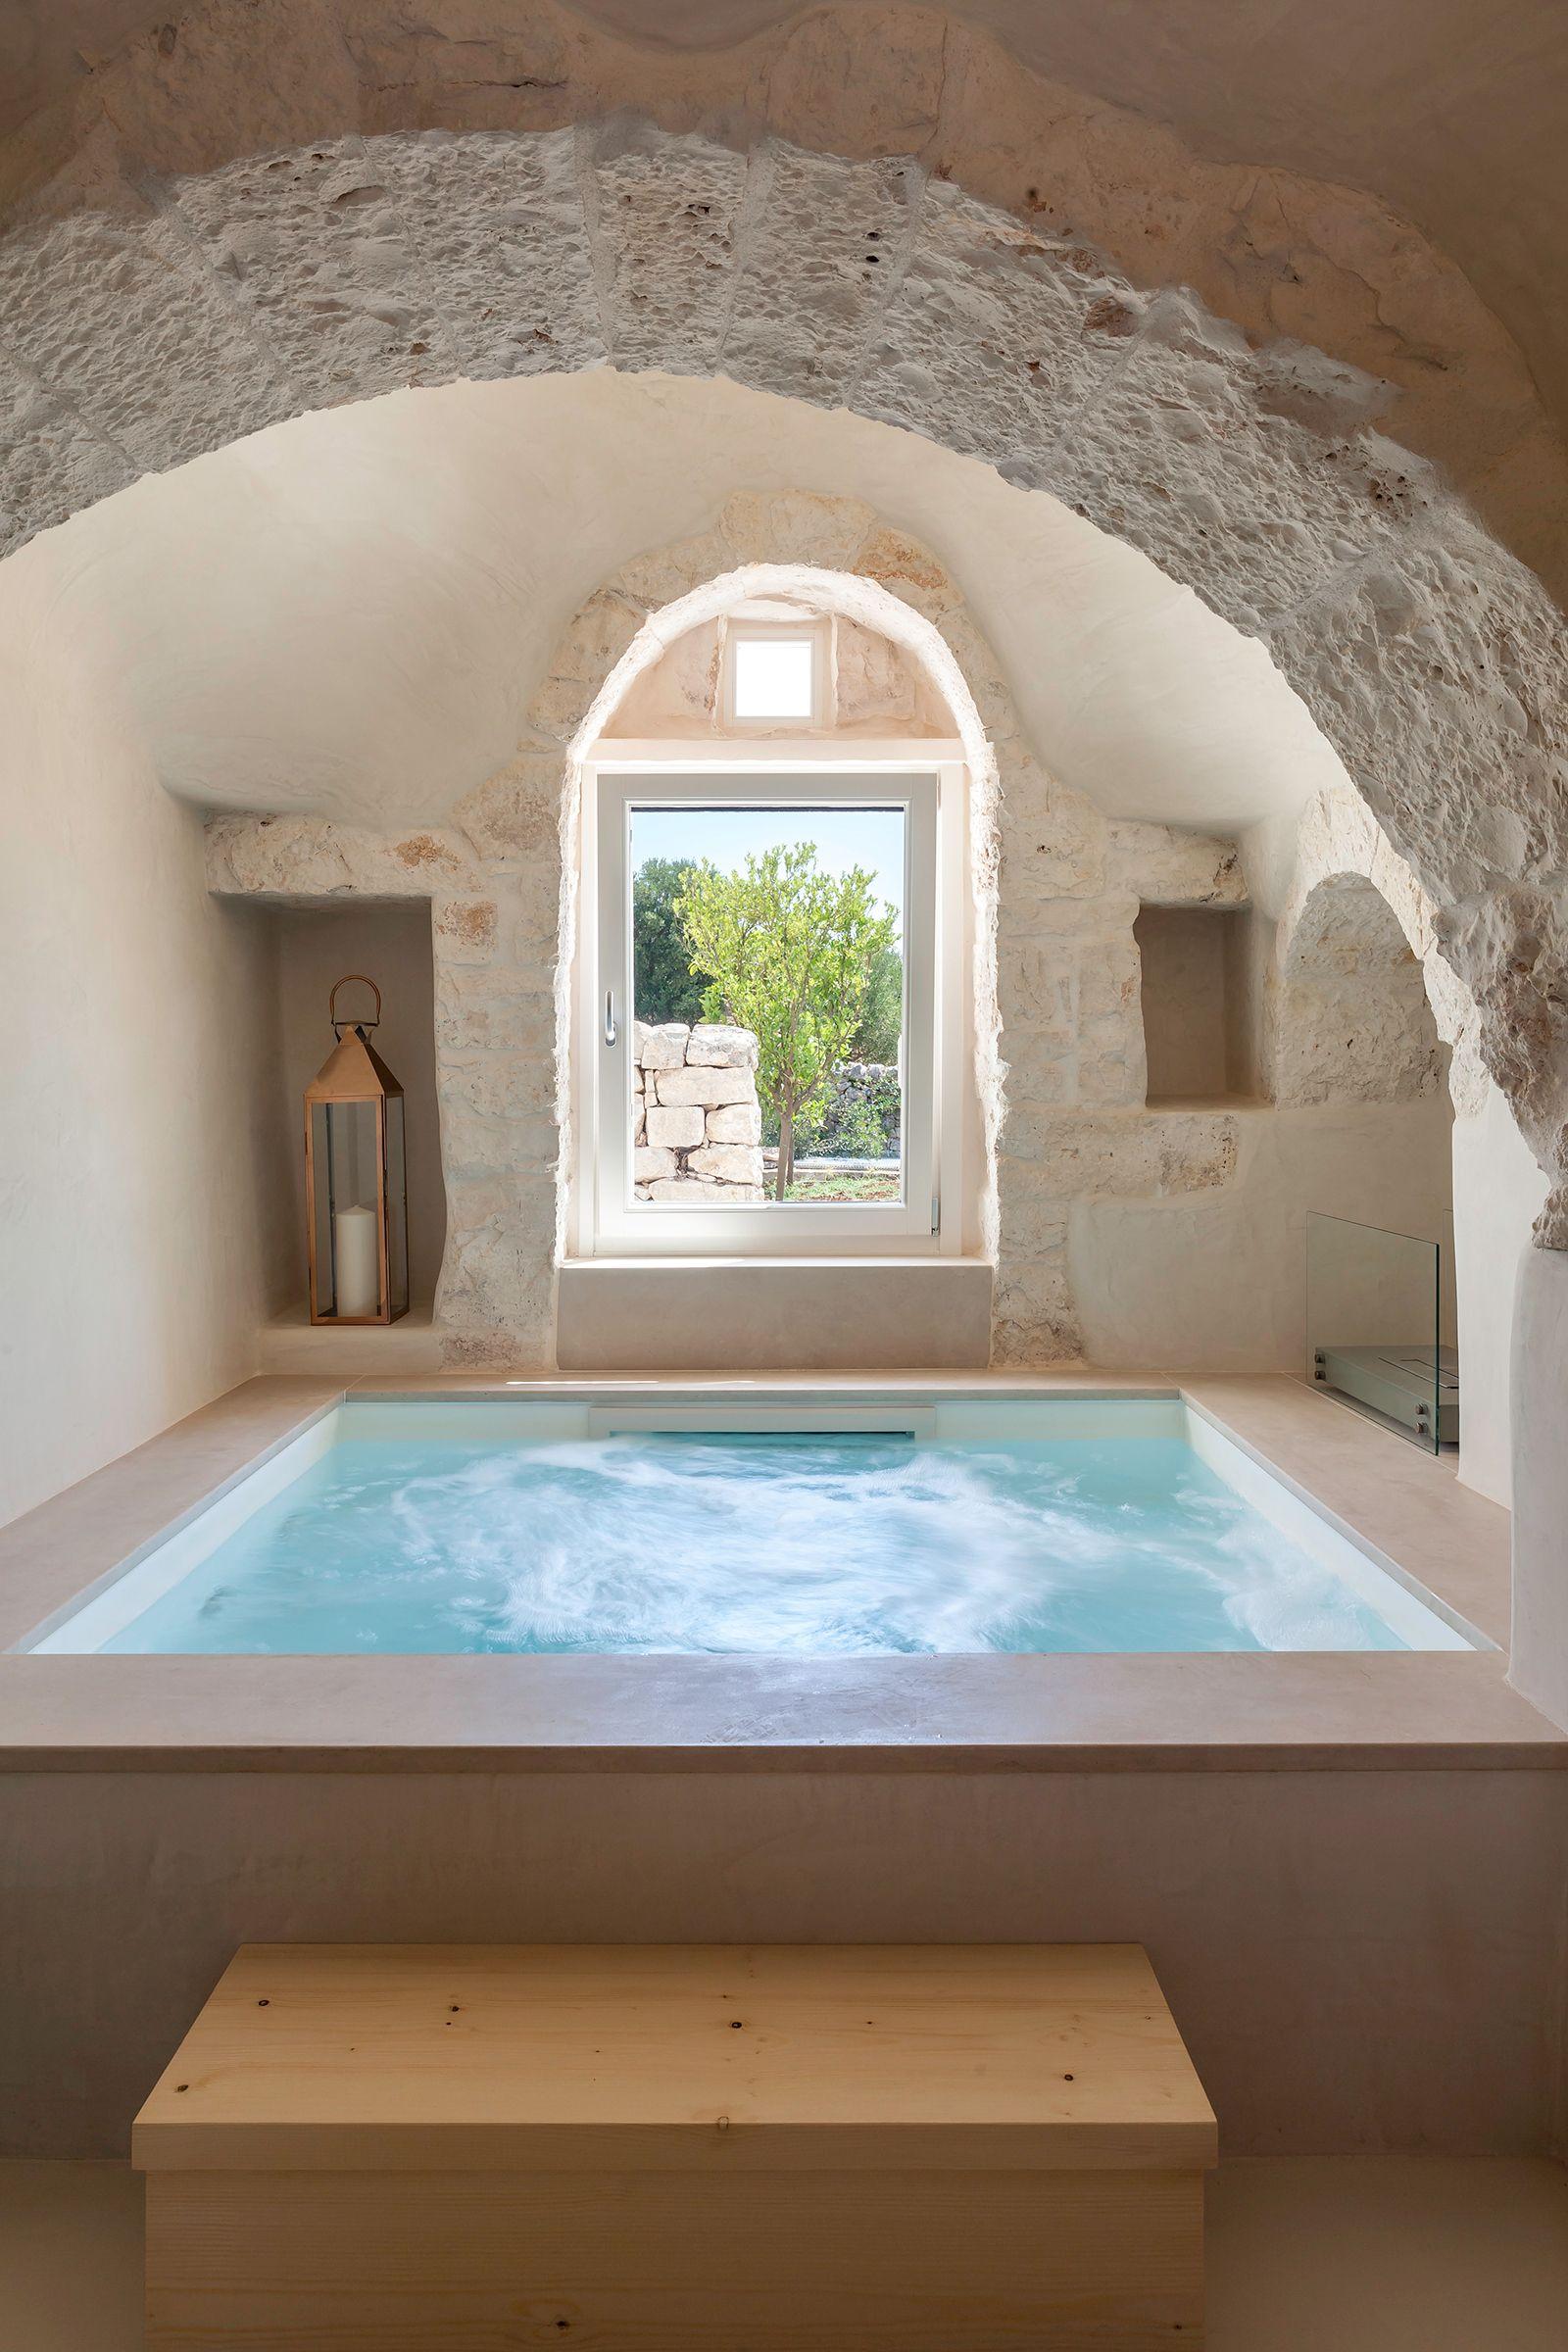 #puglia #apulia #italy  #architecture #archilovers #design #interiordesign #interiorinspo #interiorinspiration #architecturelovers #homedecor #style #designer #homedesign #lifestyle #bathroom